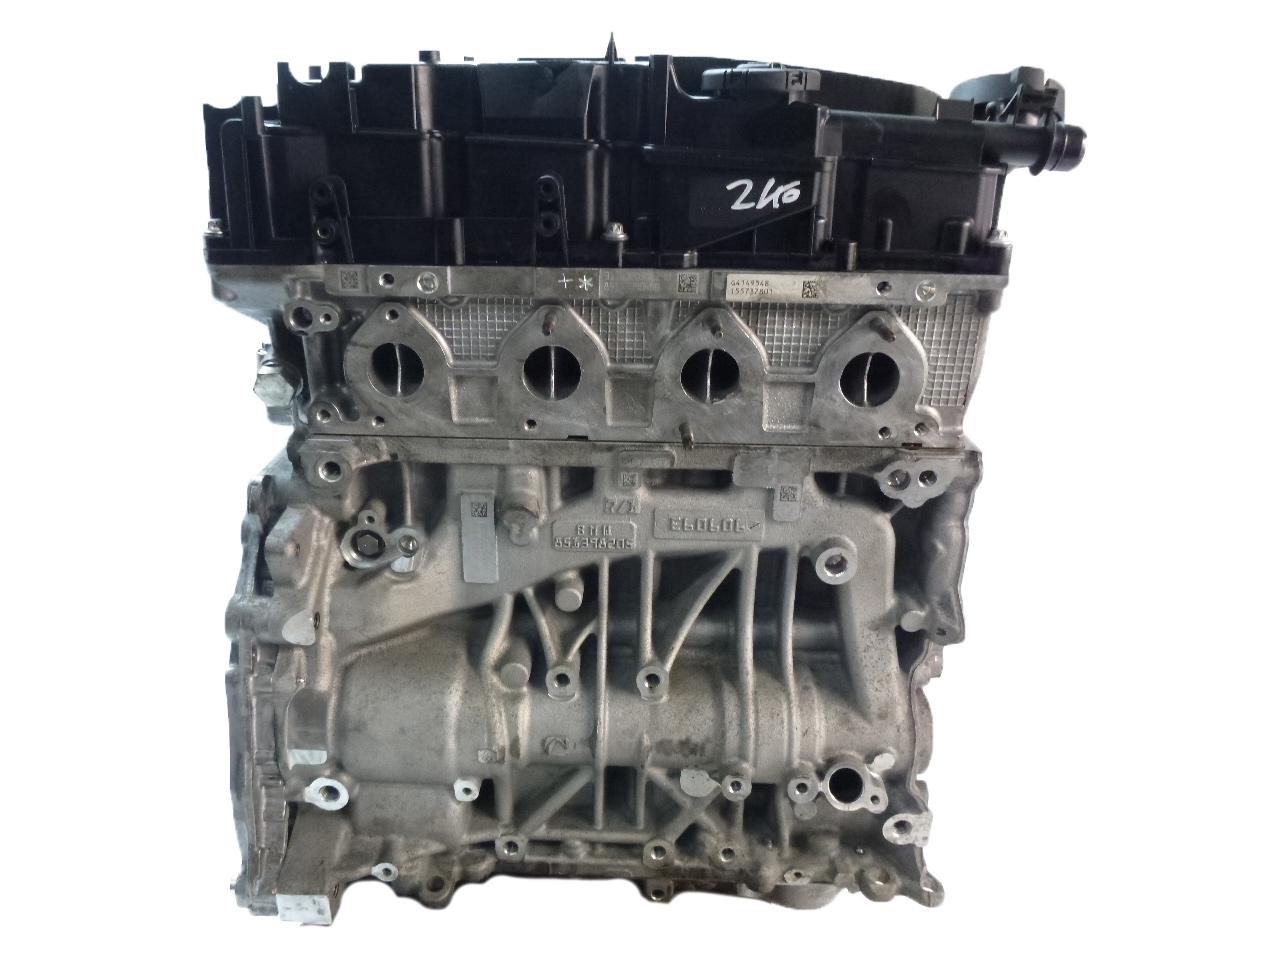 Motor BMW F30 F34 F31 F32 F21 F36 F45 F23 F10 F20 2,0 D Diesel B47 B47D20A